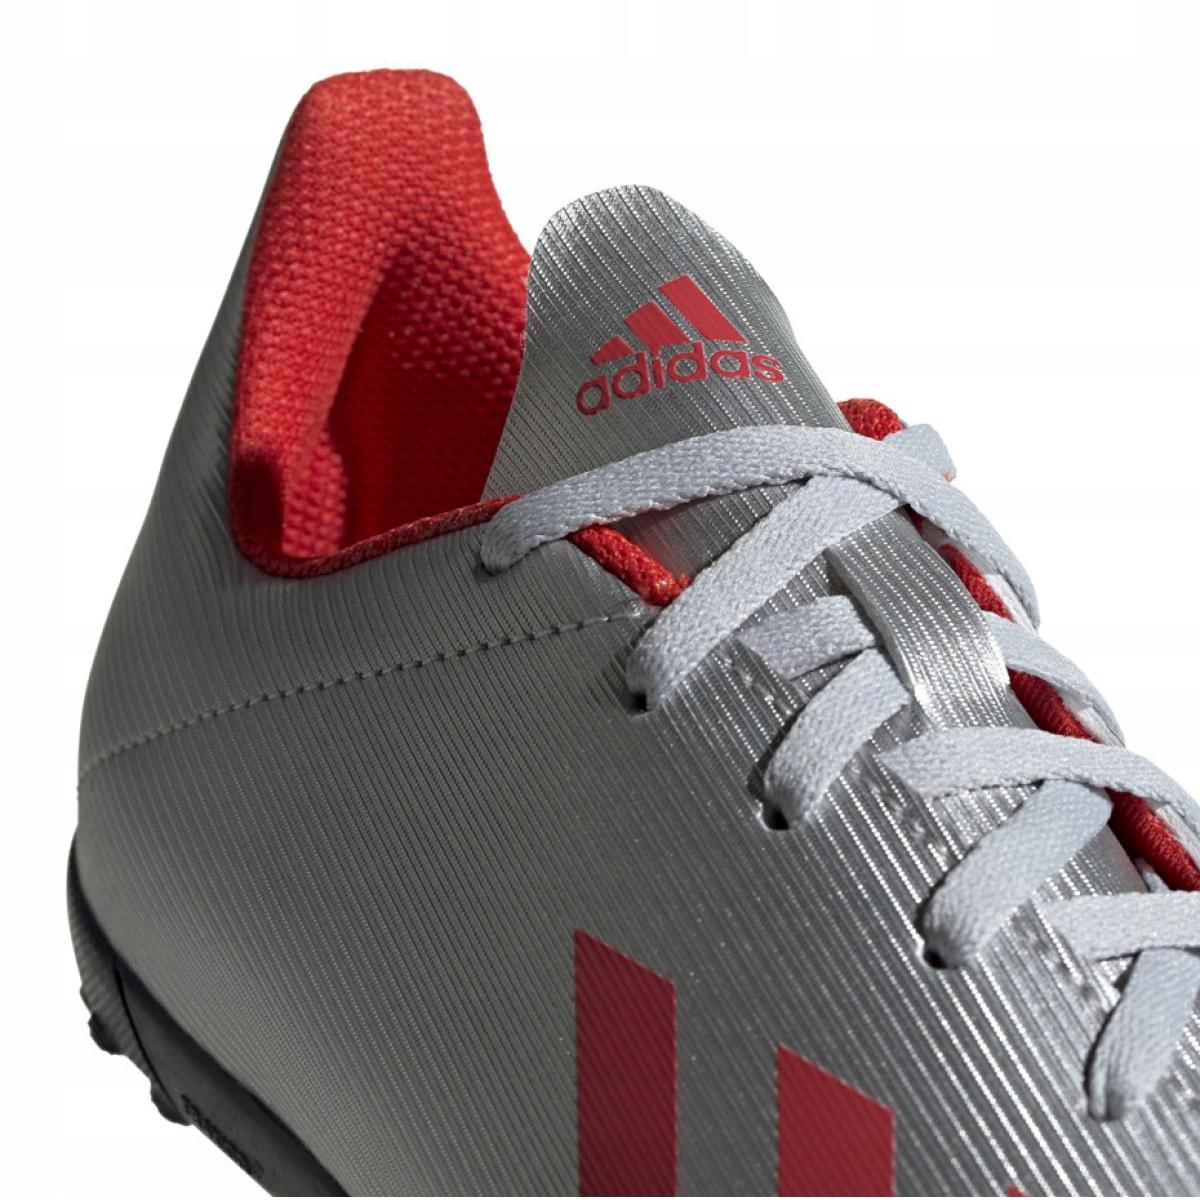 Foot 19 F35348 Chaussures Wd92ehiy De X 4 Tf Jr Adidas jLqSMUzVpG